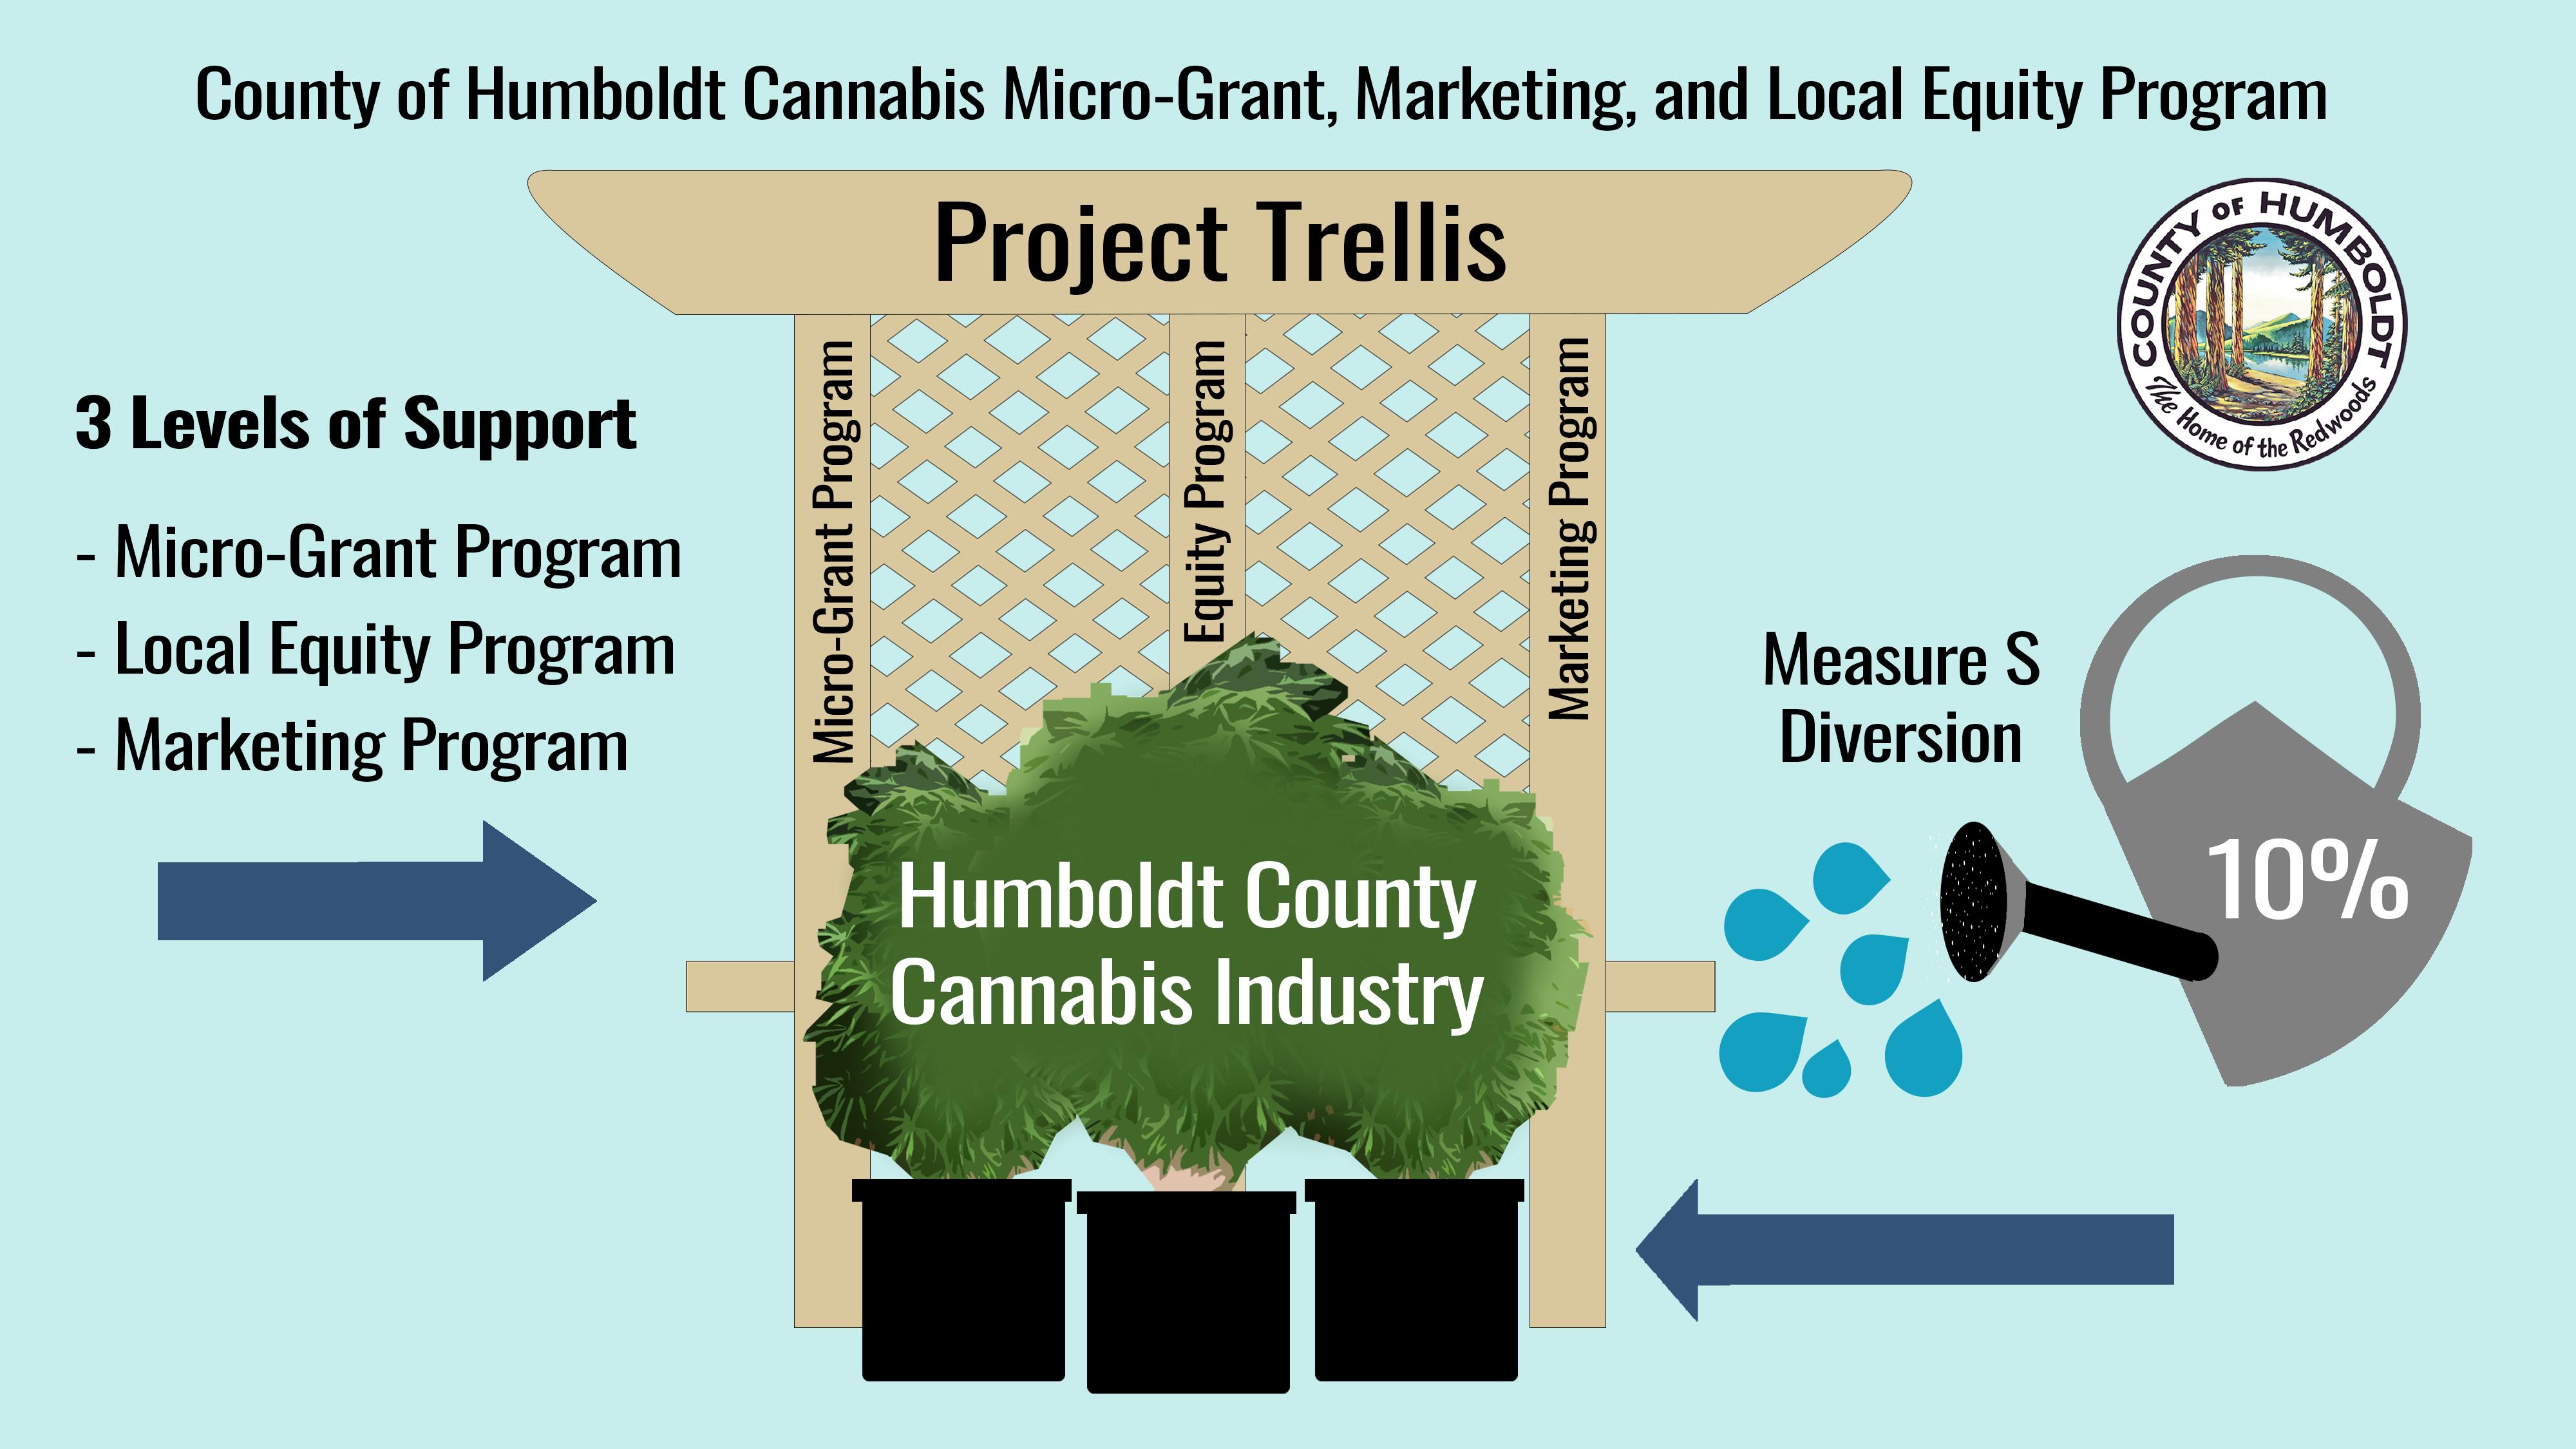 Humboldt County Cannabis Project Trellis